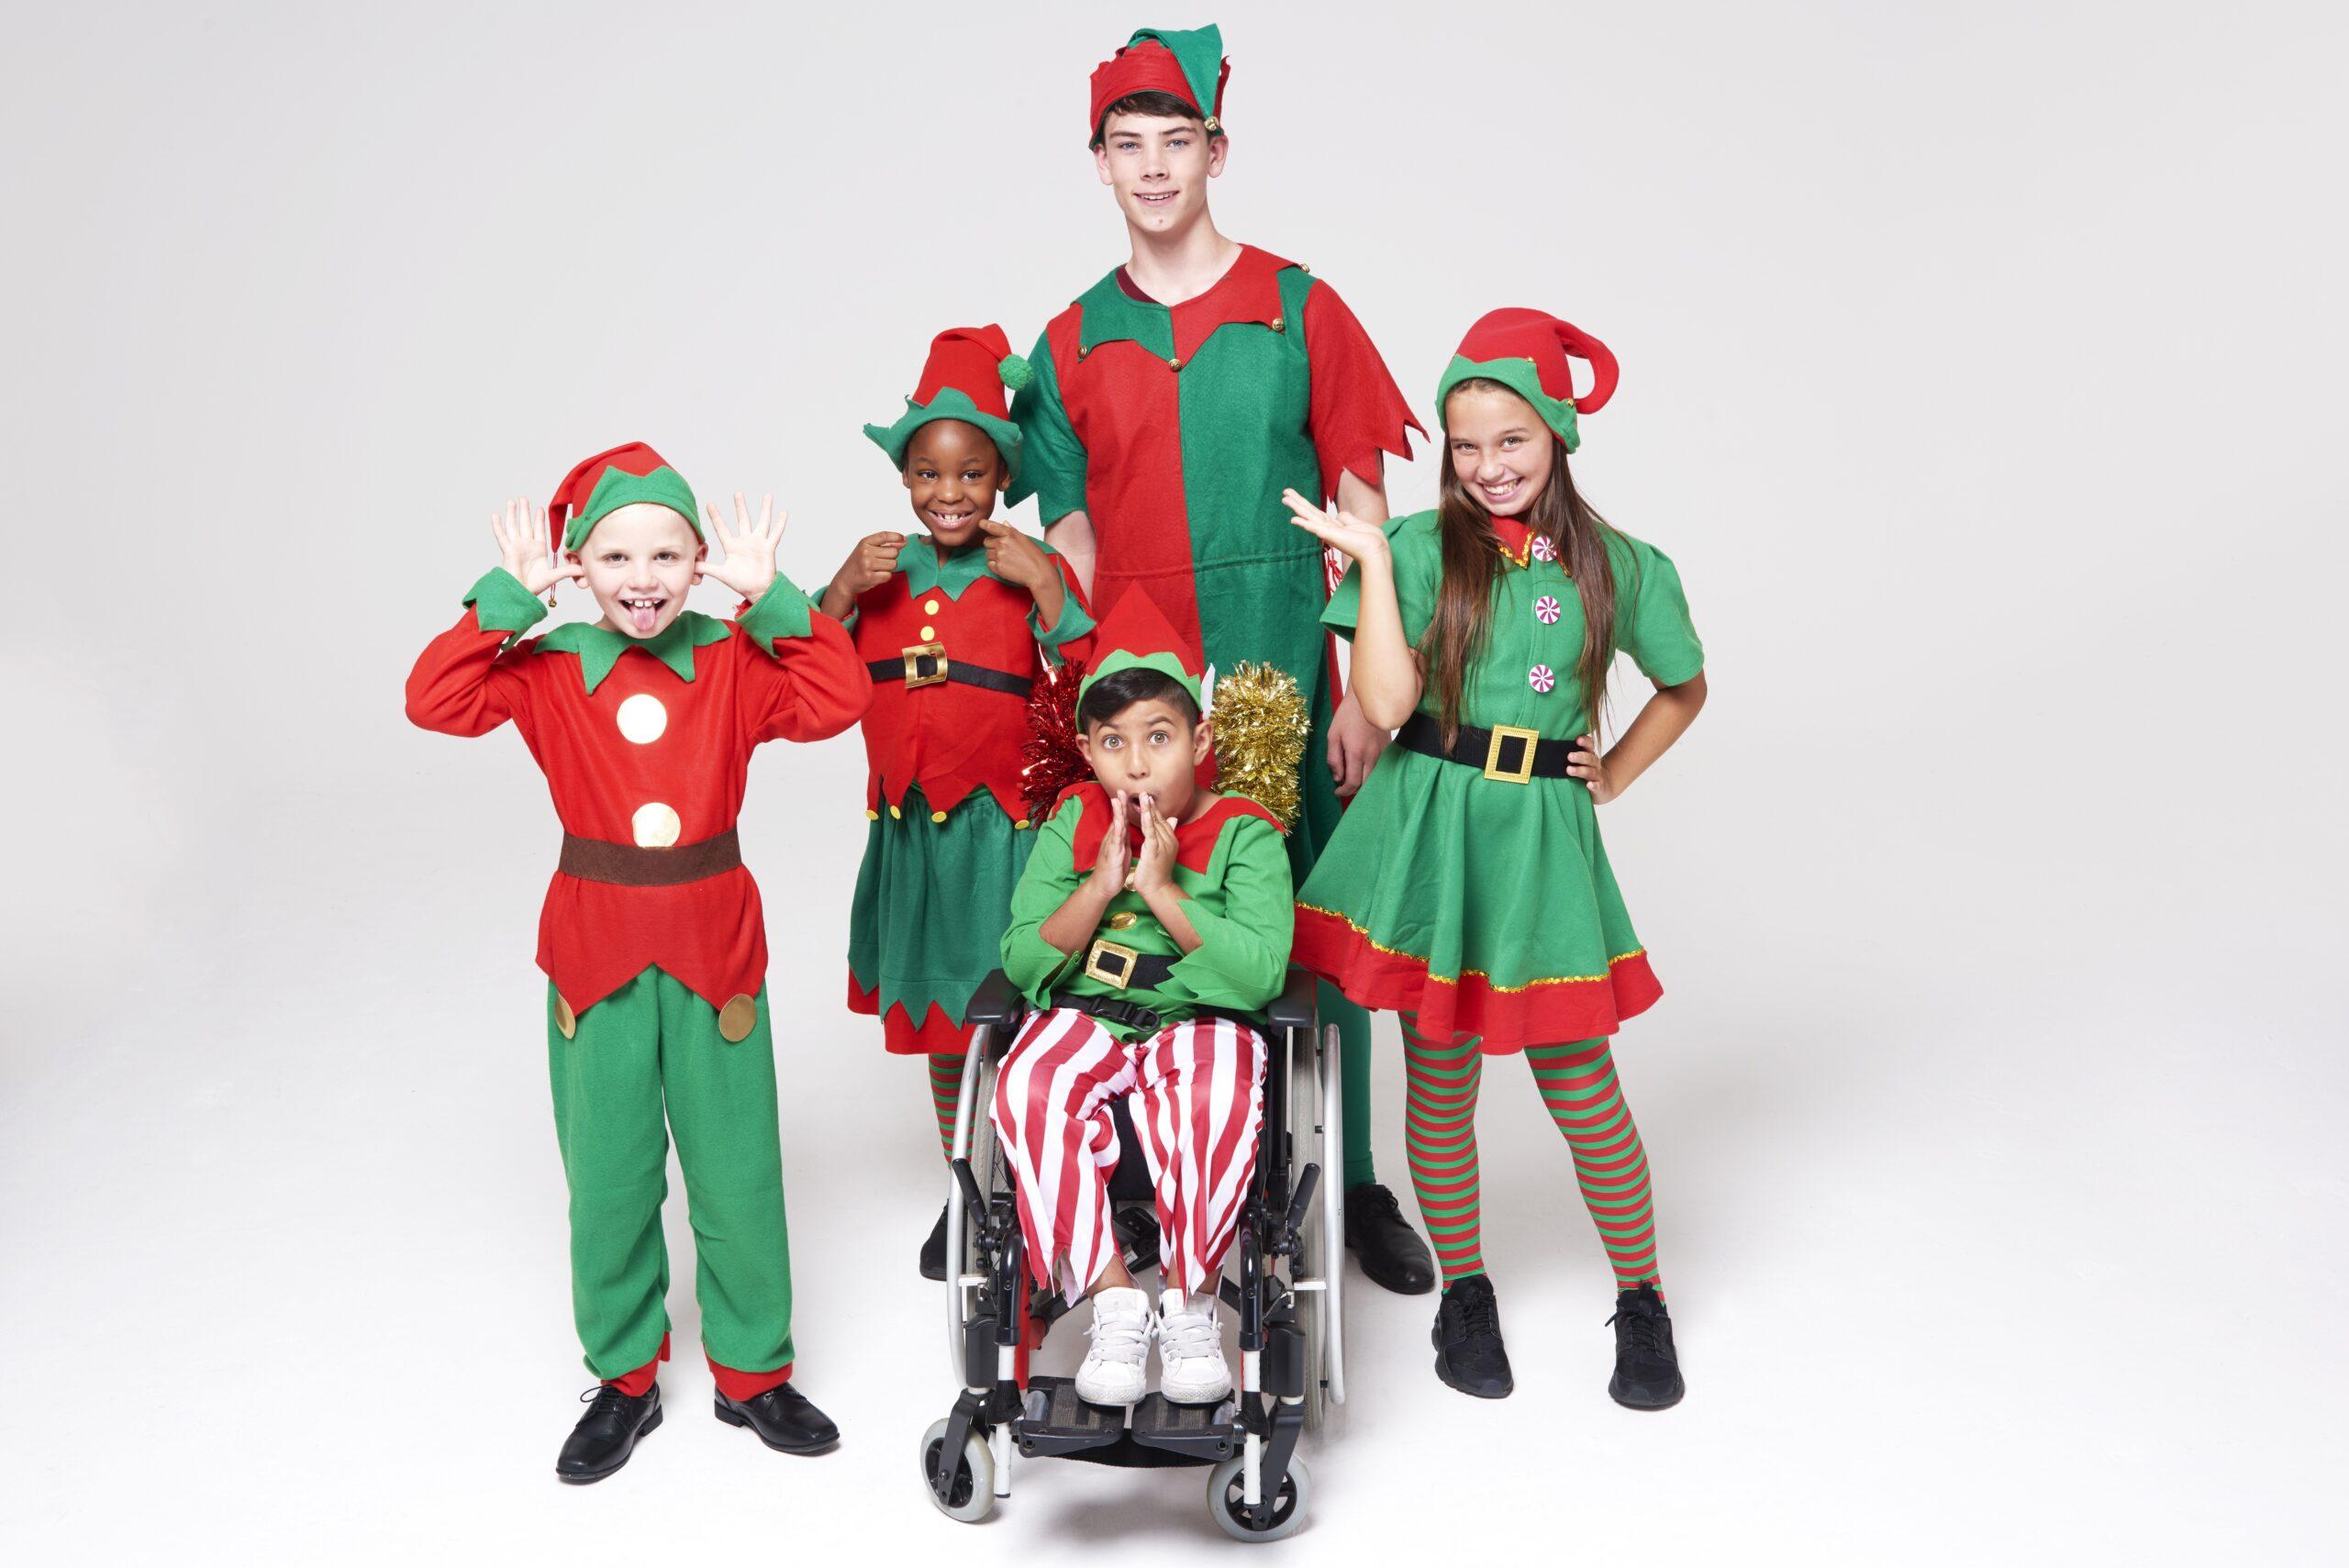 Elf Day 2020